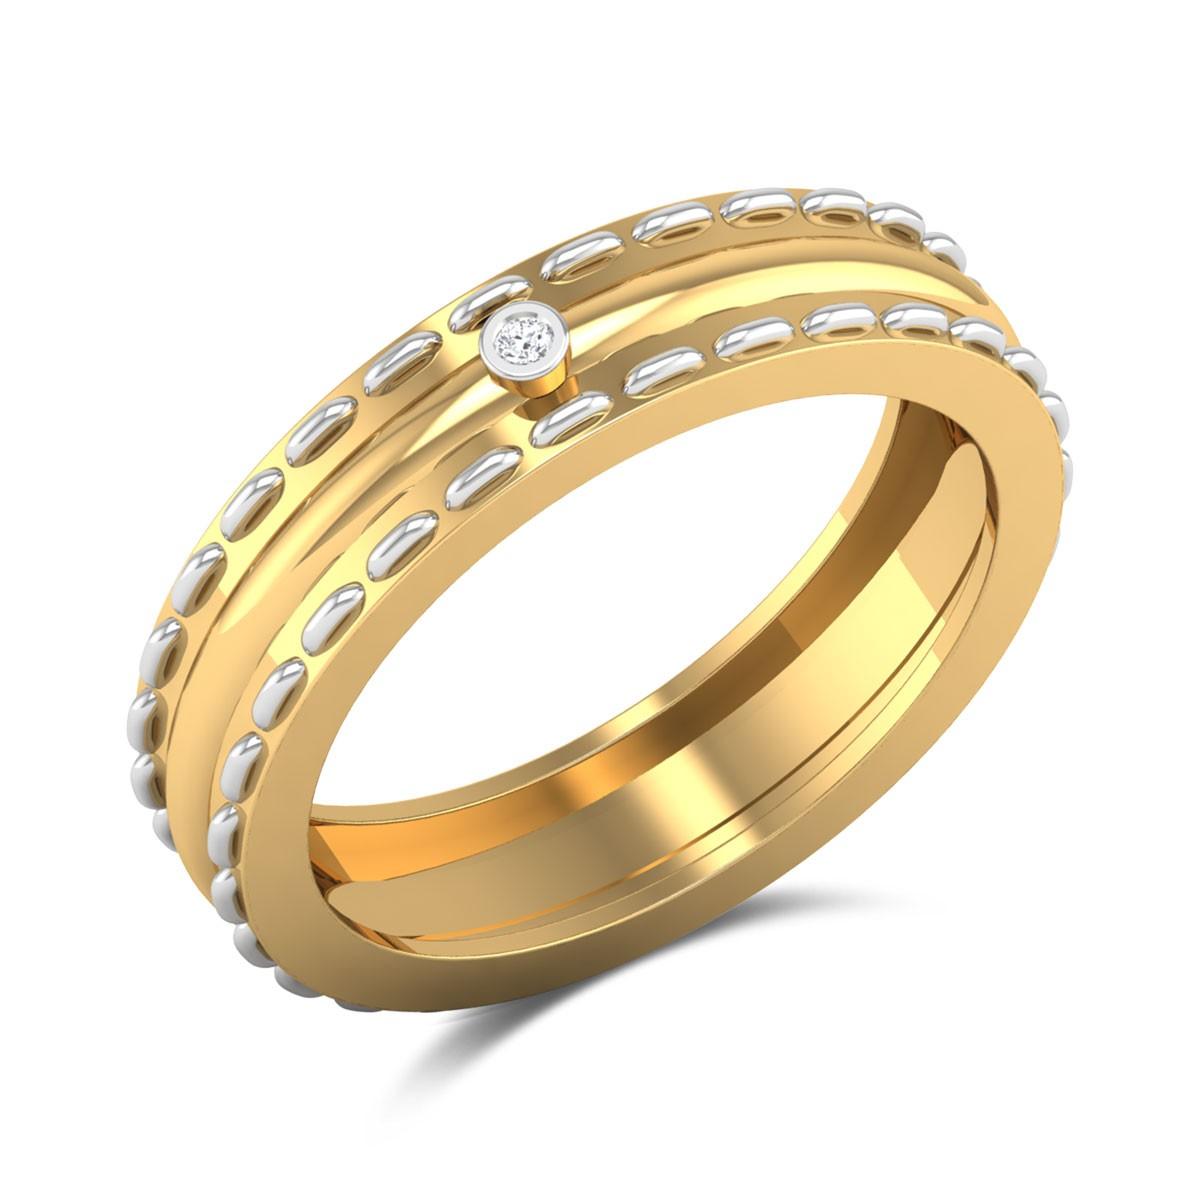 Wiiliam Diamond Ring